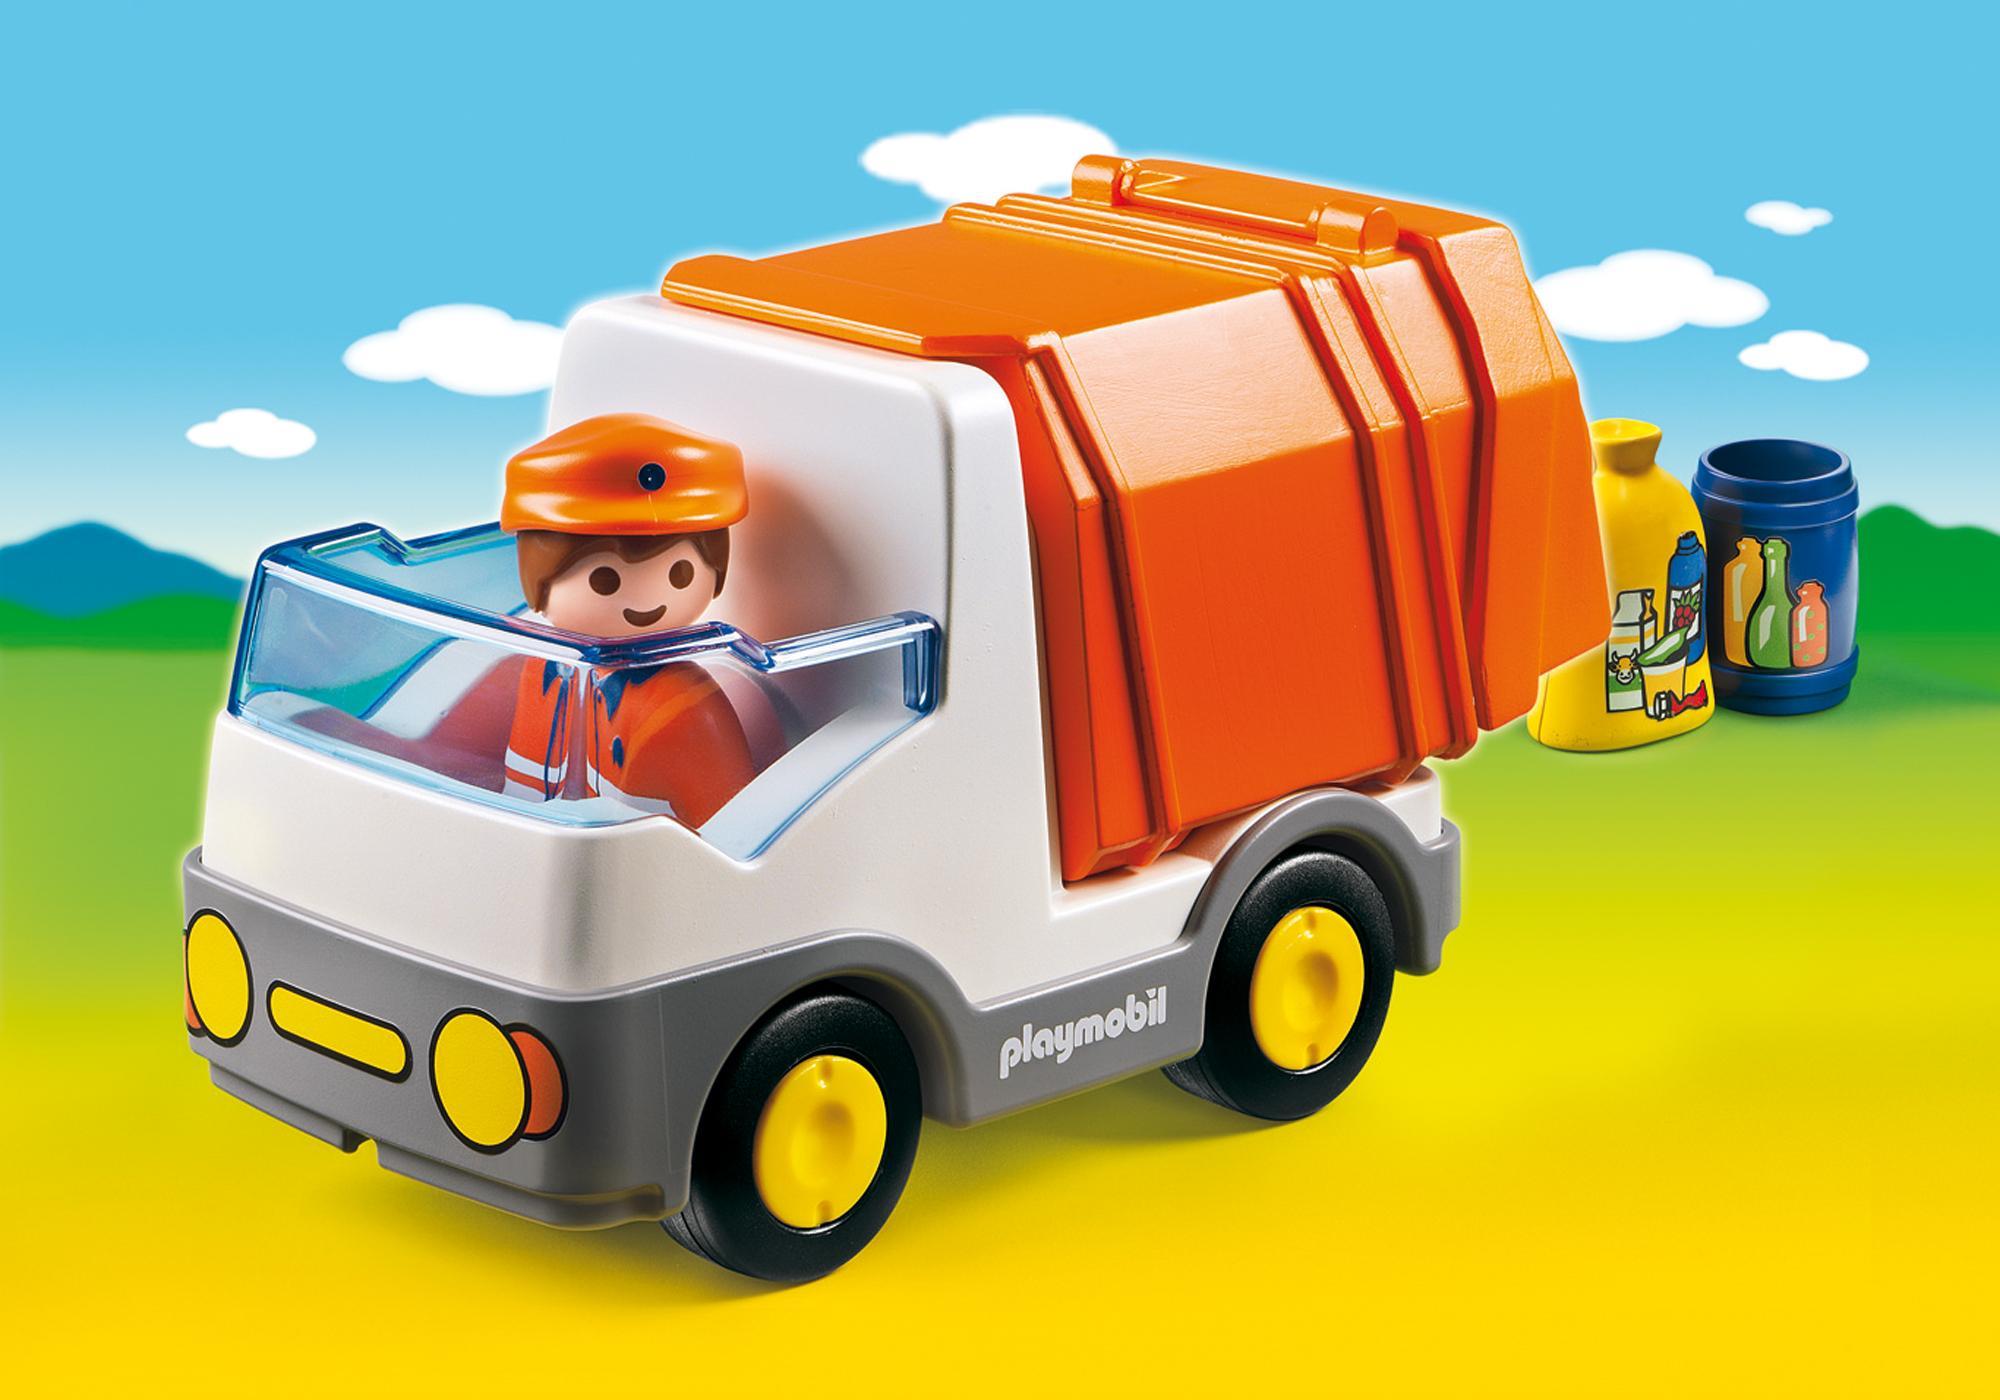 http://media.playmobil.com/i/playmobil/6774-A_product_detail/Müllauto